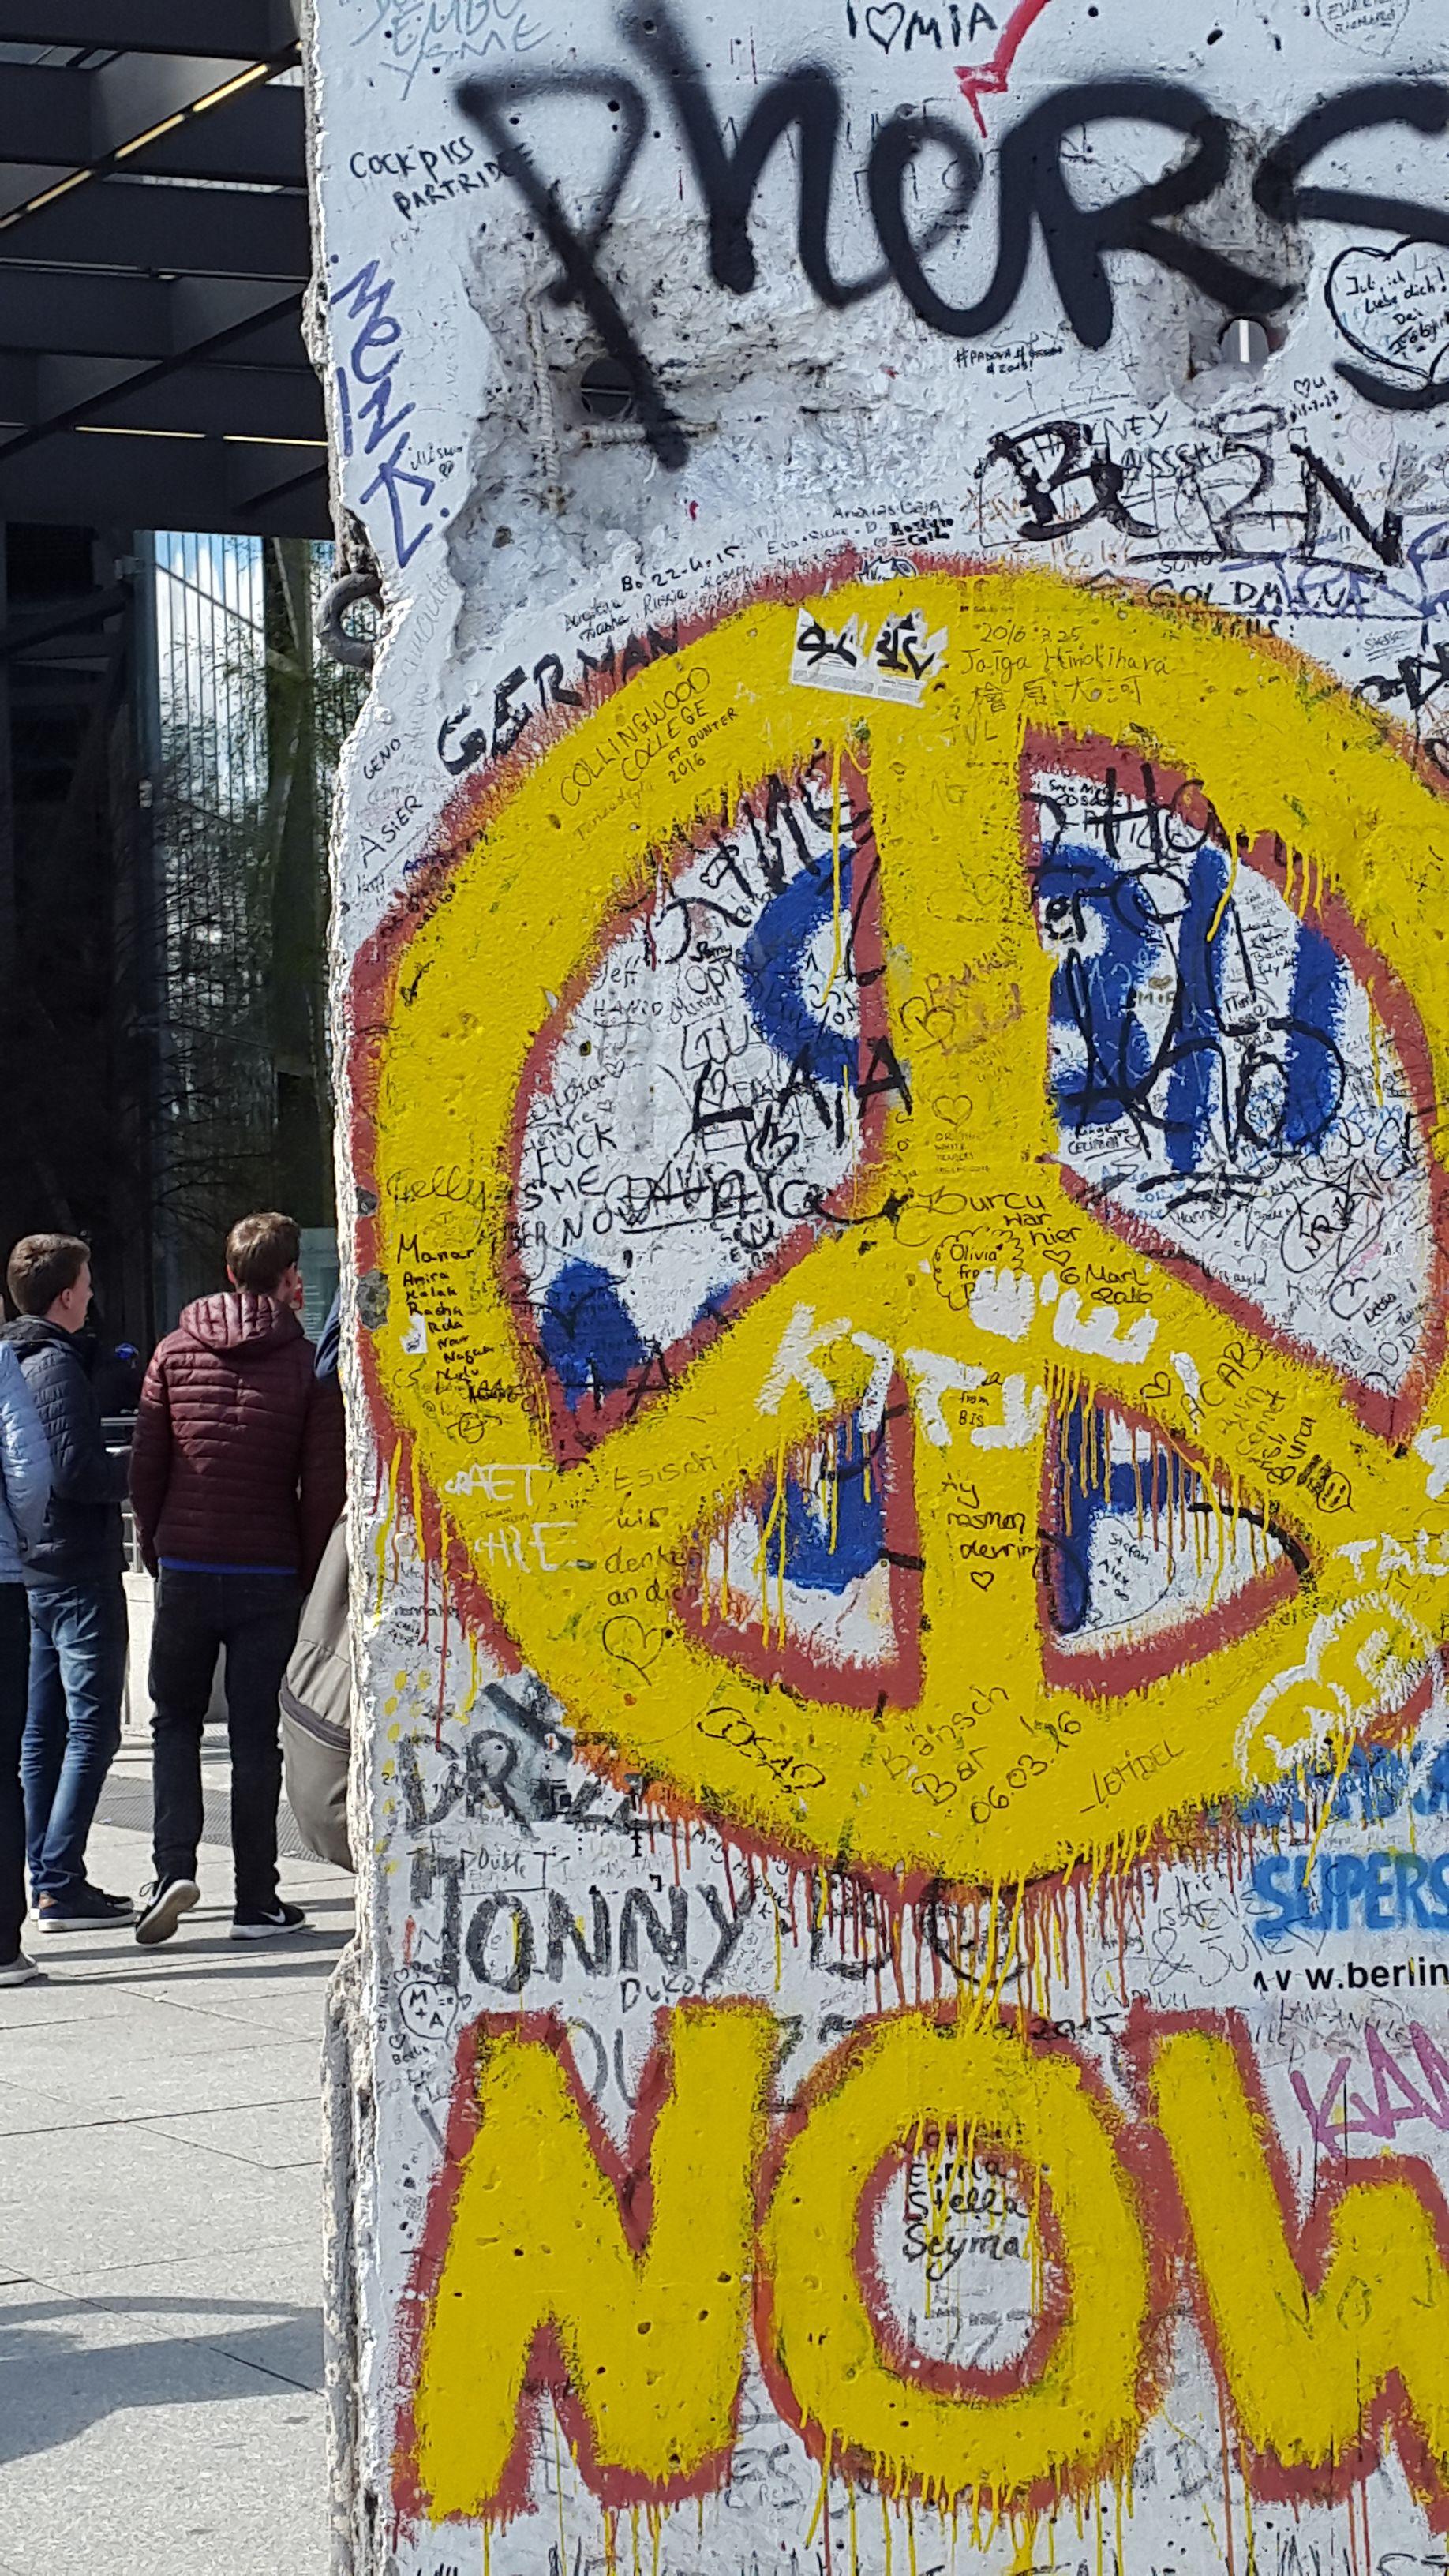 File:Part of the Berlin wall.jpeg - Wikimedia Commons